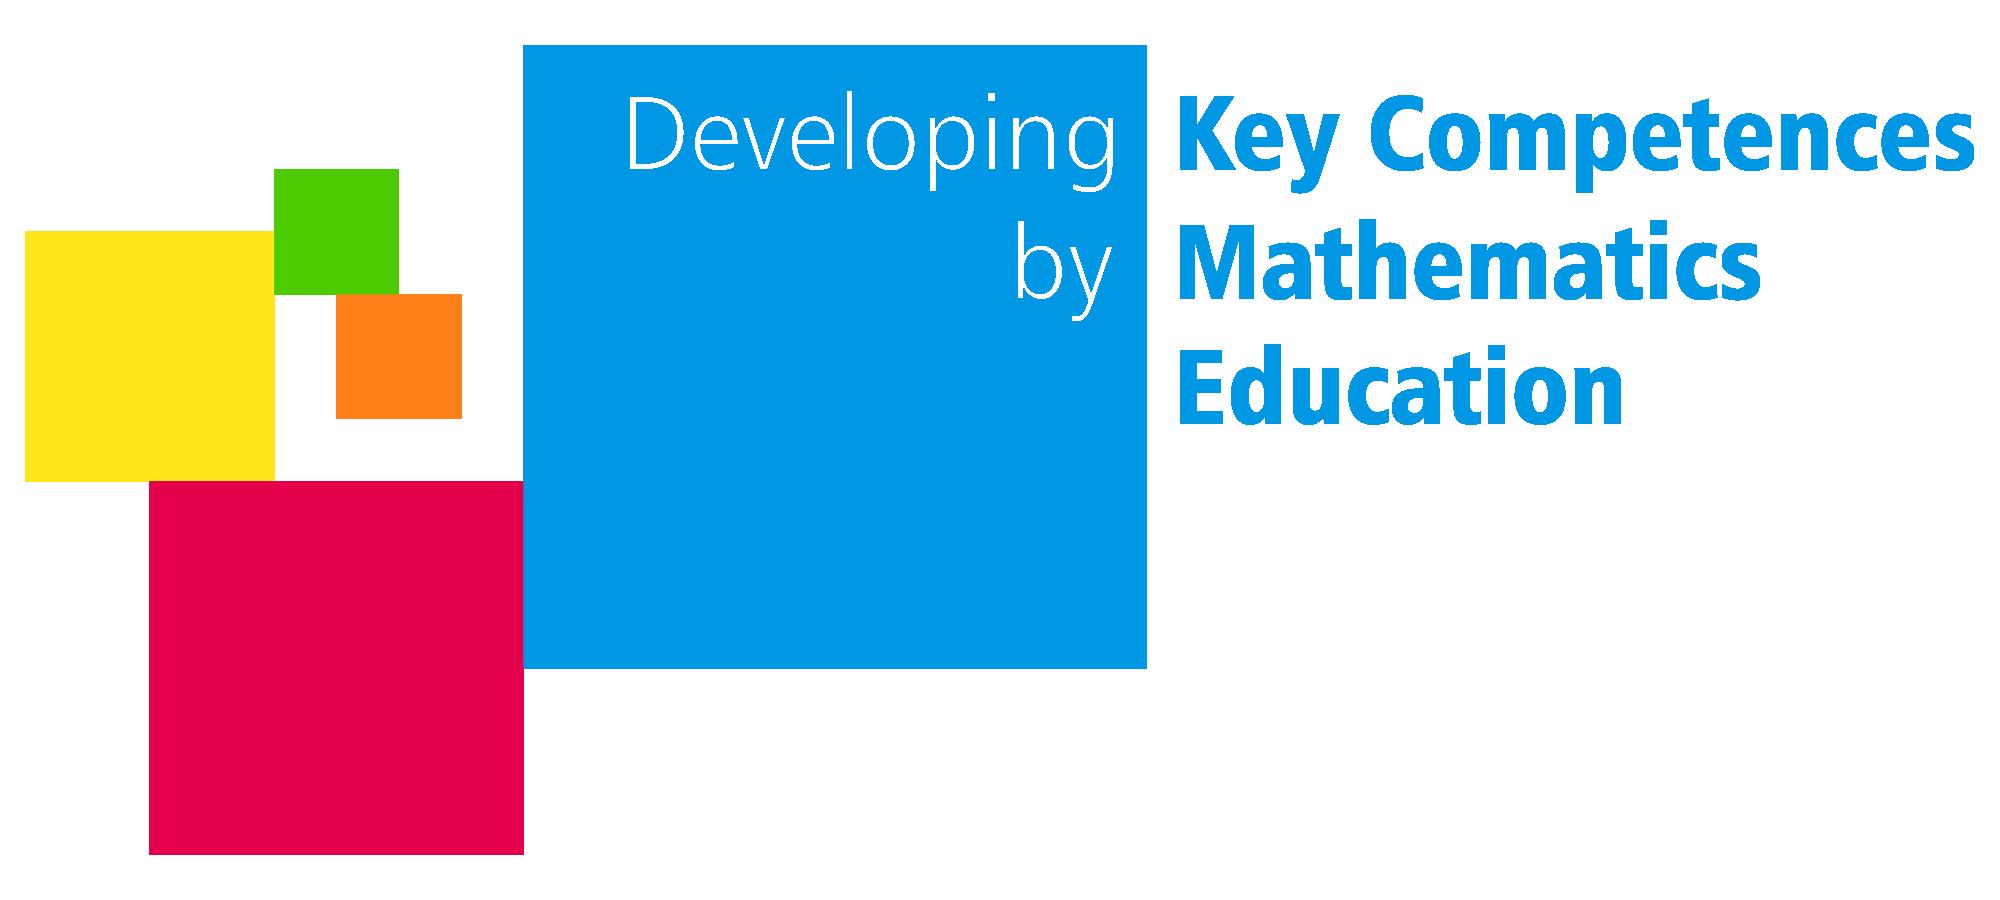 Developing Key Competences by Mathematics Education